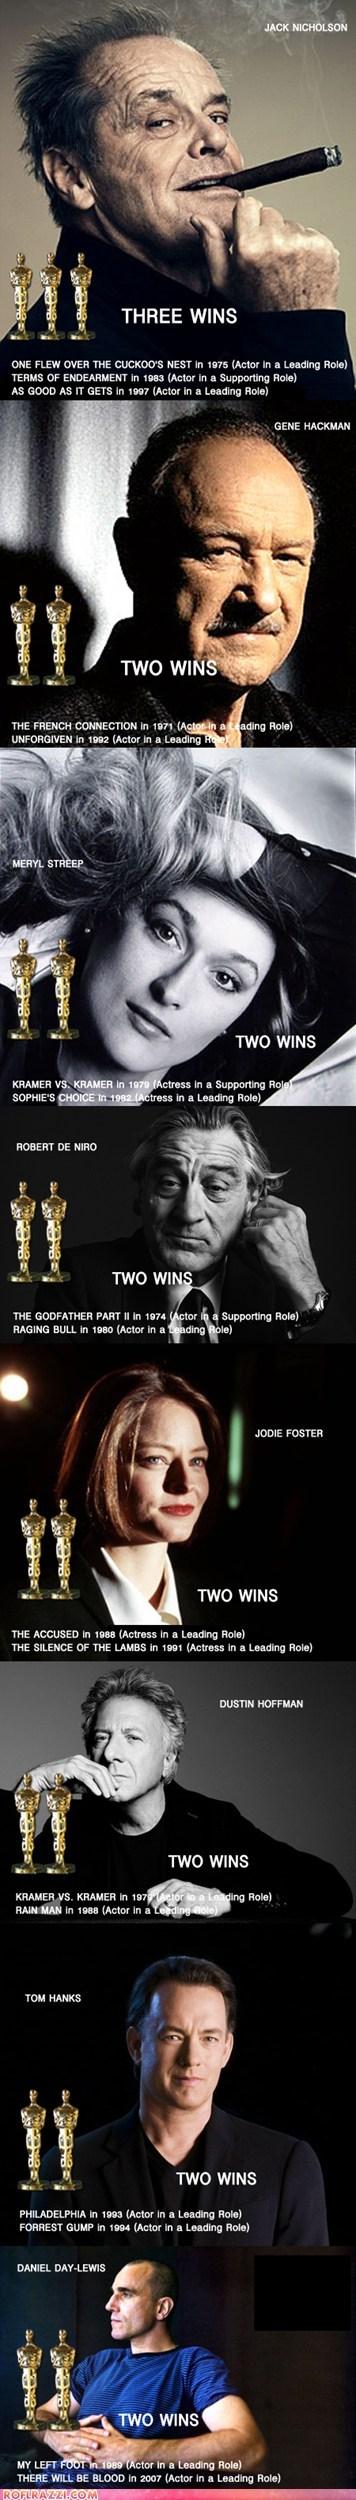 academy awards actor celeb daniel day-lewis Dustin Hoffman gene hackman jack nicholson jodie foster Meryl Streep oscars robert de niro tom hanks - 5874298624